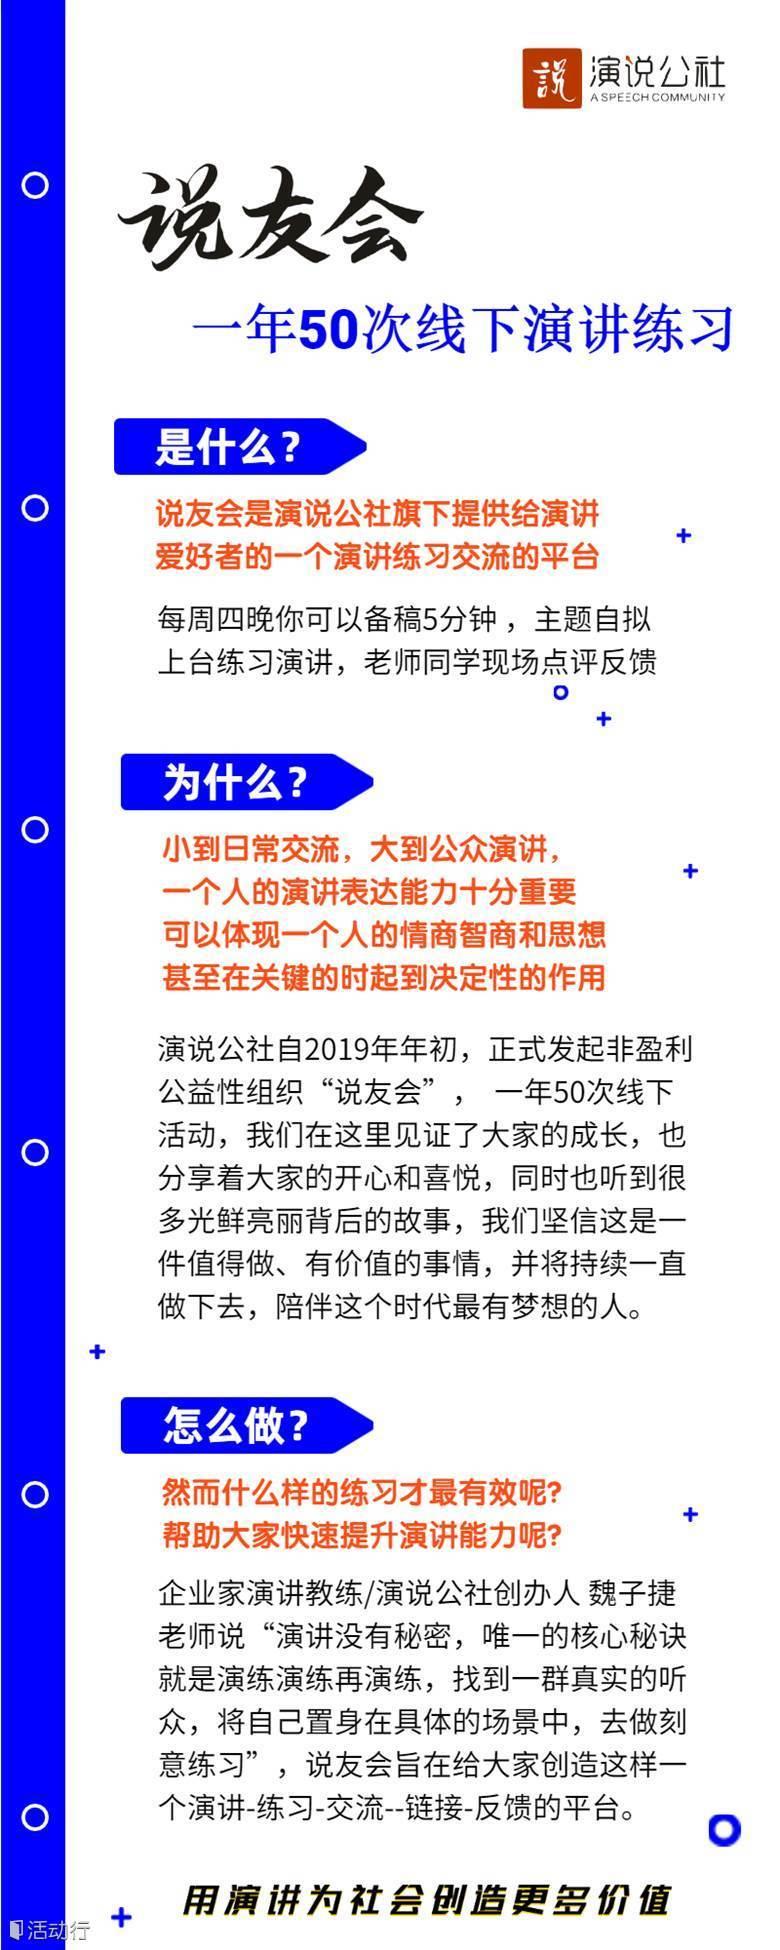 http://www.huodongxing.com/file/20201030/3043955848055/134139488078294.png